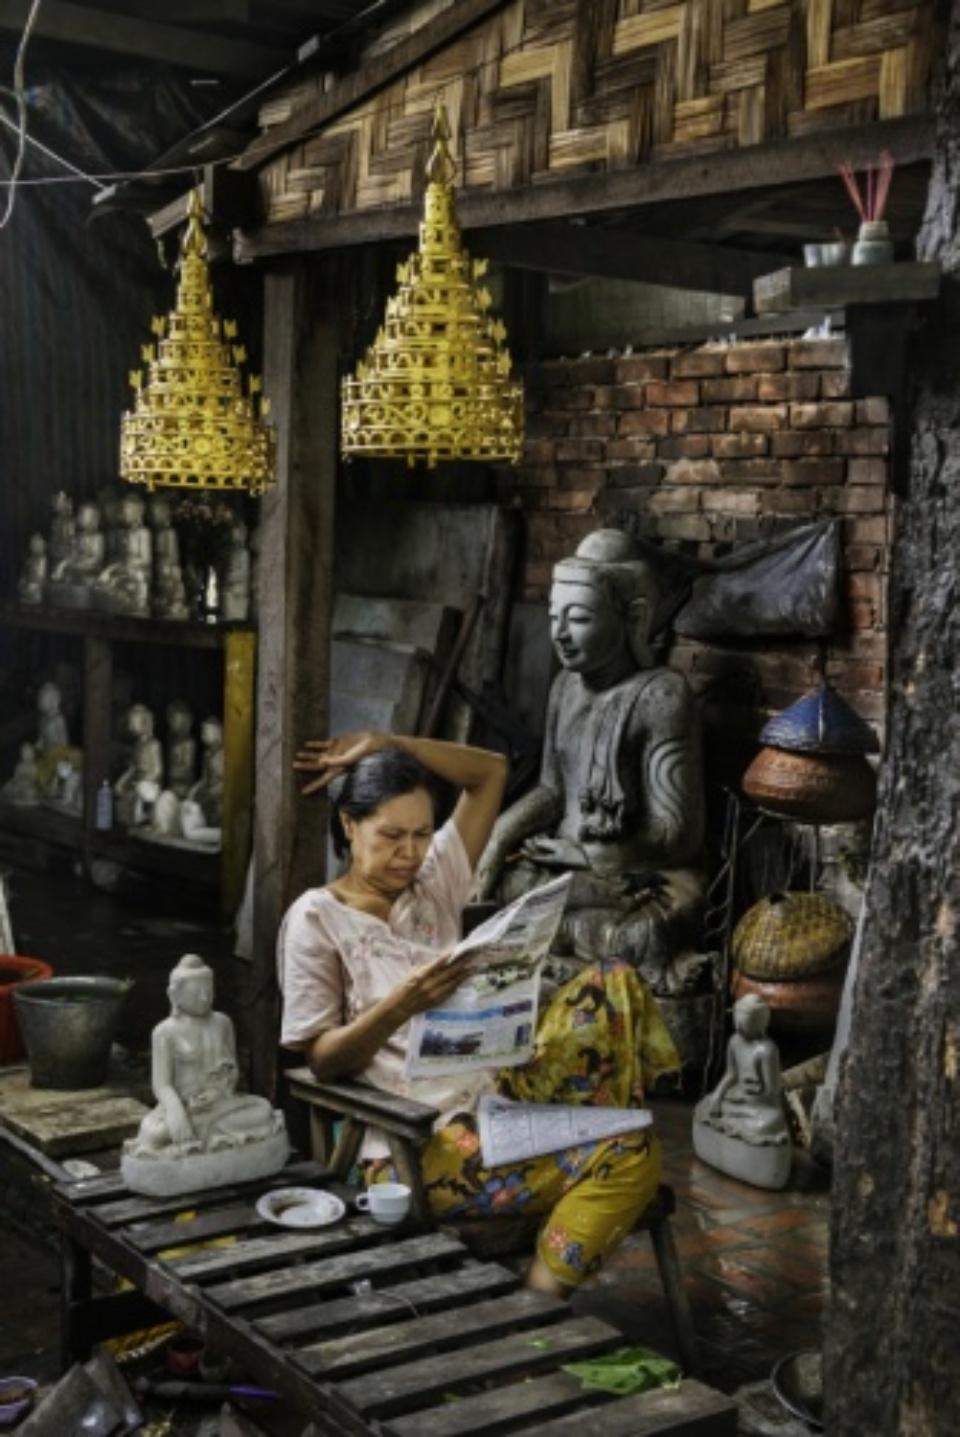 Steve McCurry: A Woman reads a Newspaper in her Shop Burma, 2013